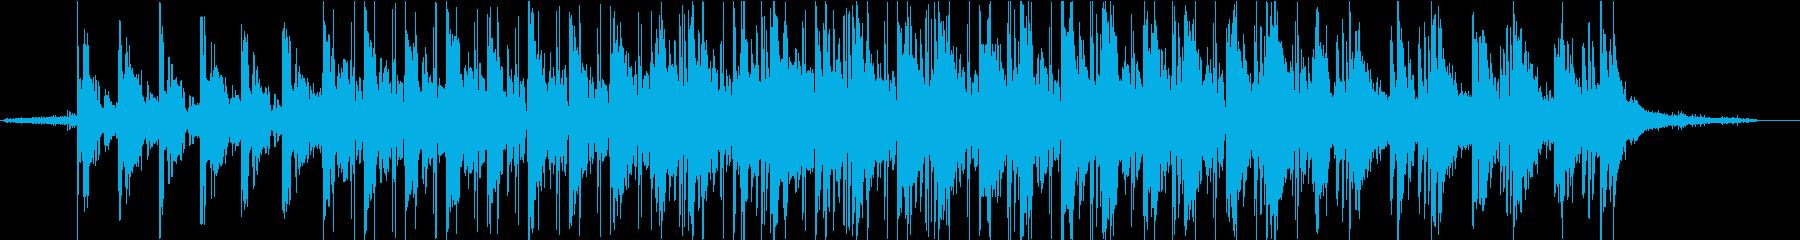 CHILLでlo-fiなHIPHOPの再生済みの波形